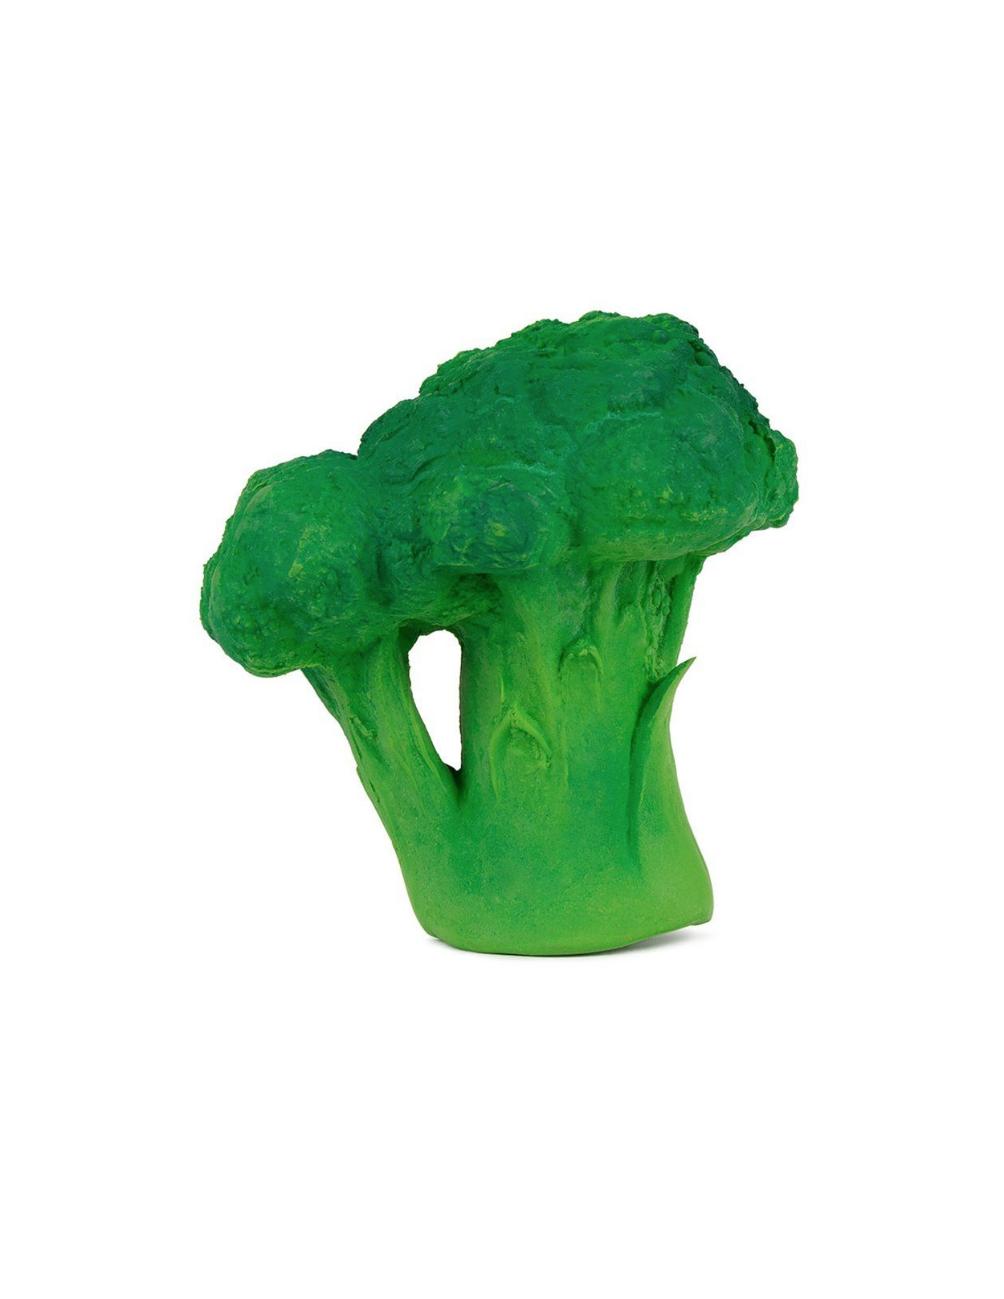 Chew Toy Brucy The Broccoli